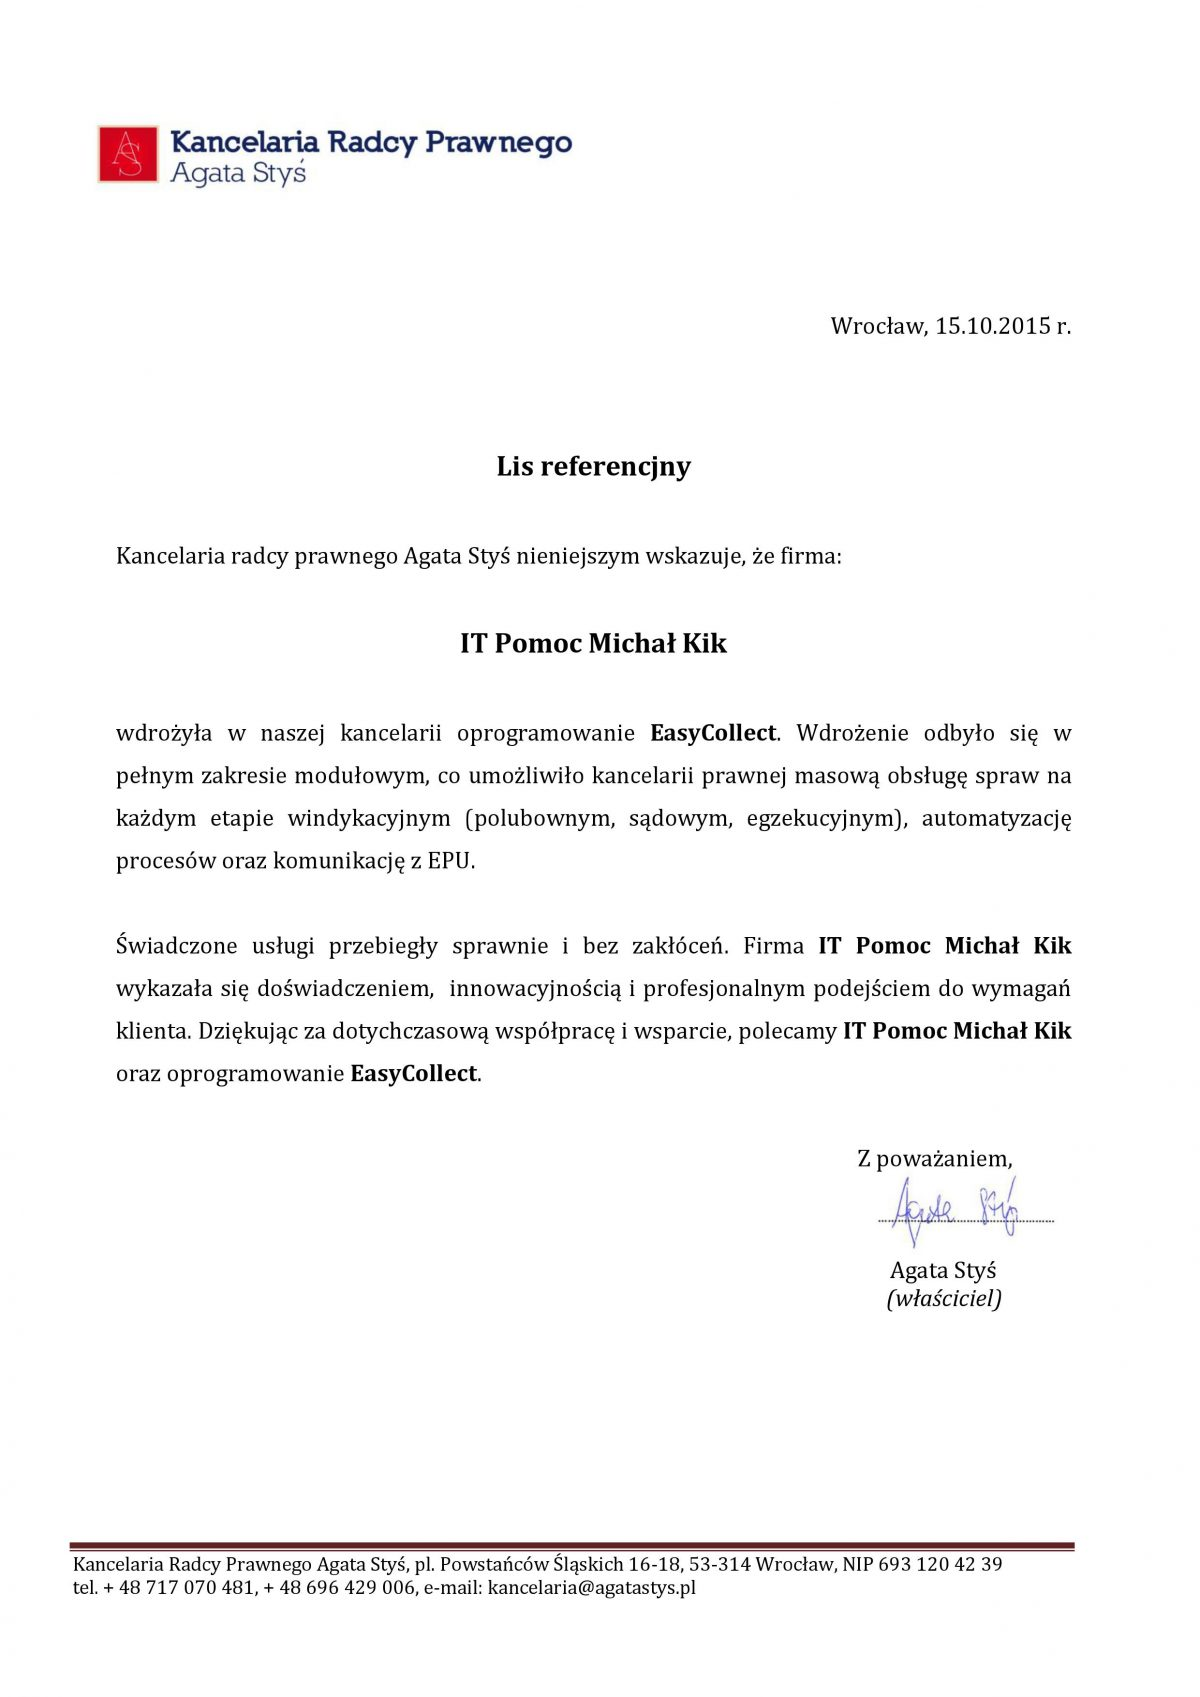 Kancelaria Radcy Prawnego Agata Styś